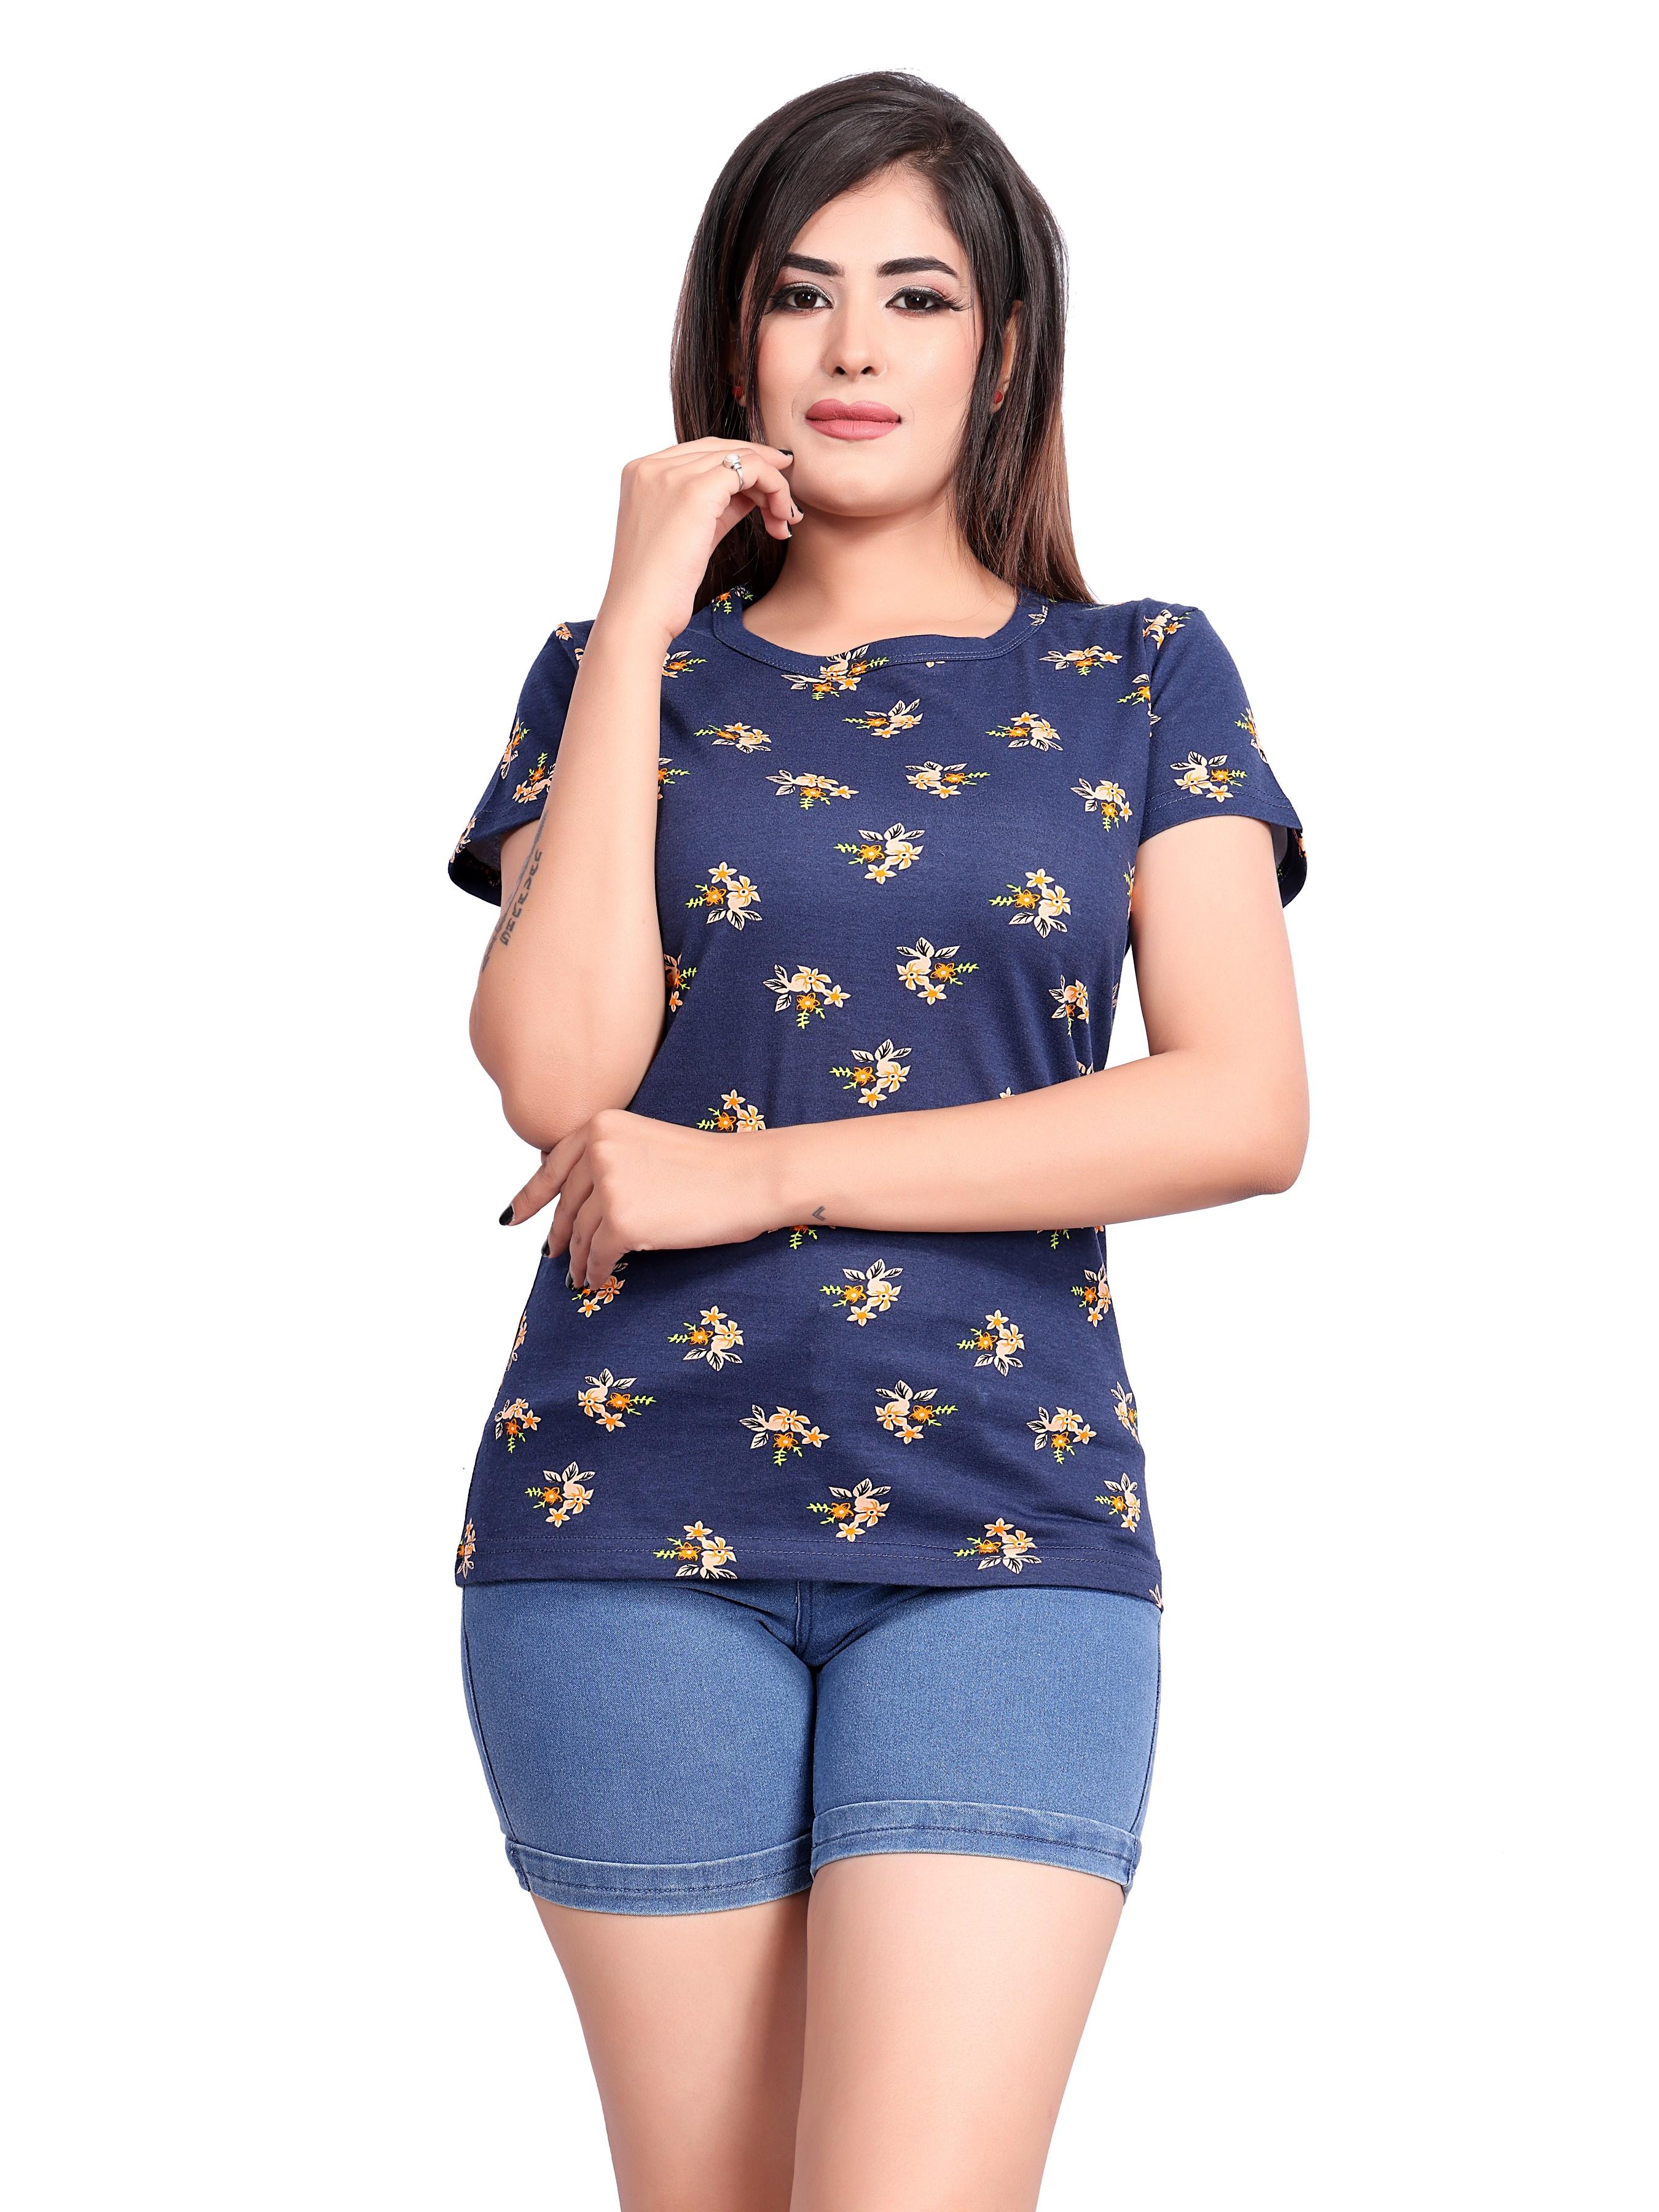 Impex | IMPEX Women's Multi Cotton Hosiery Printed Round Neck T-shirt